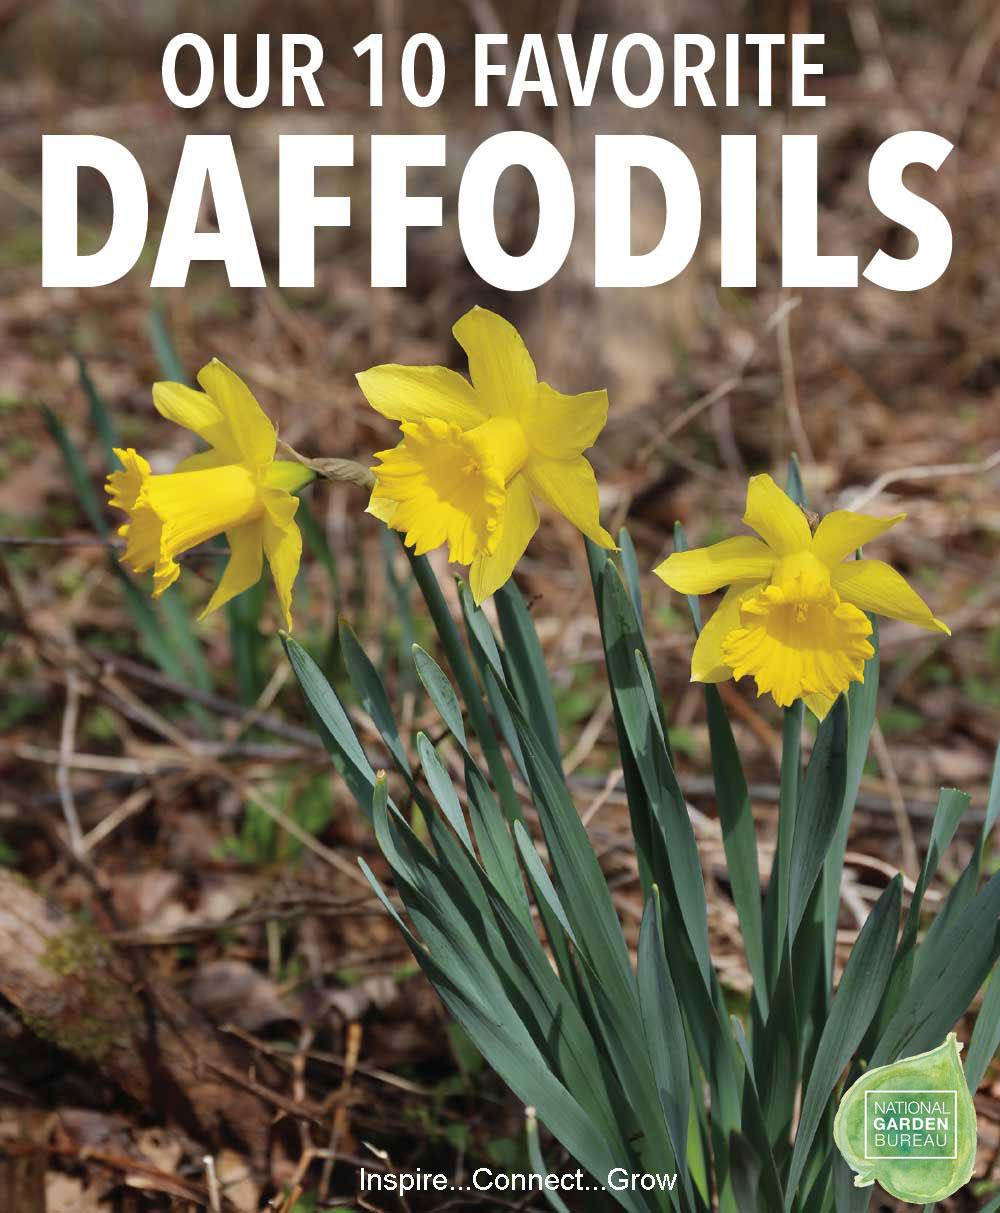 10-Favorite-Daffodils-NGB1